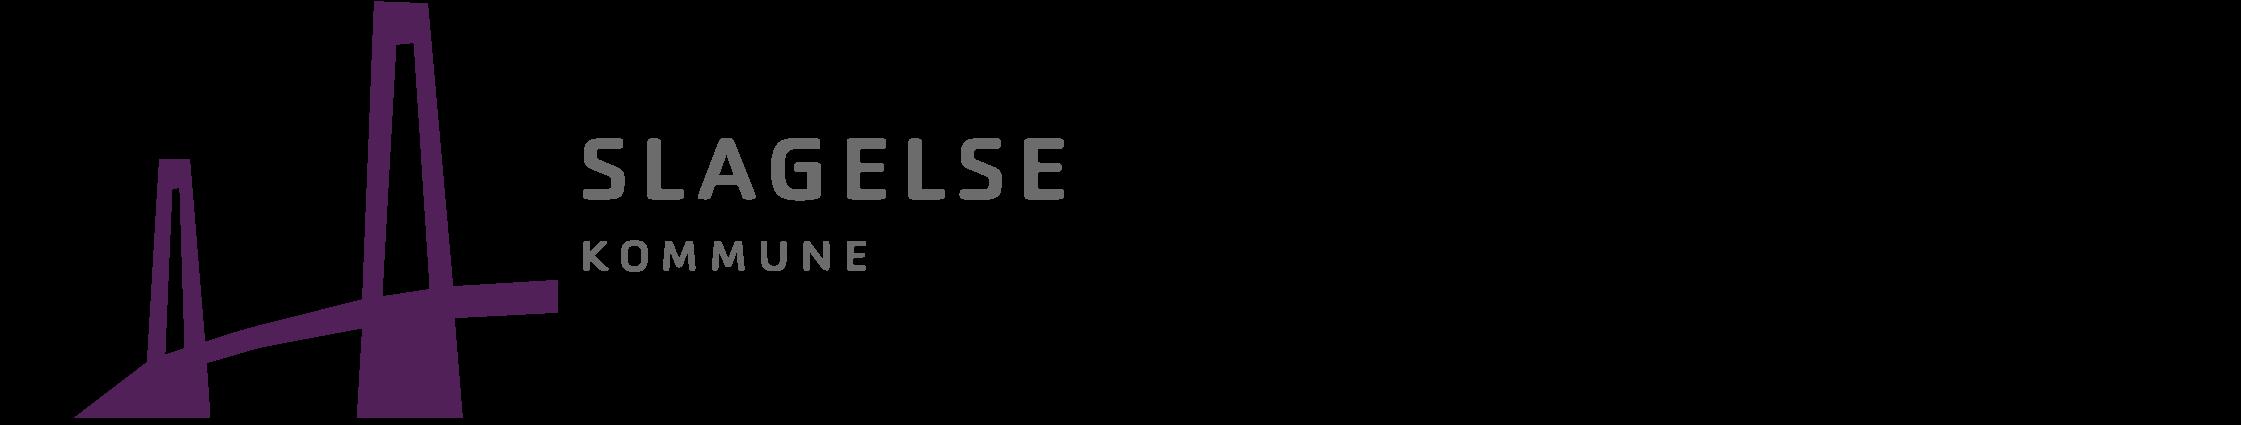 Slagelse Kommune logo samt Sjællands Vestkyst